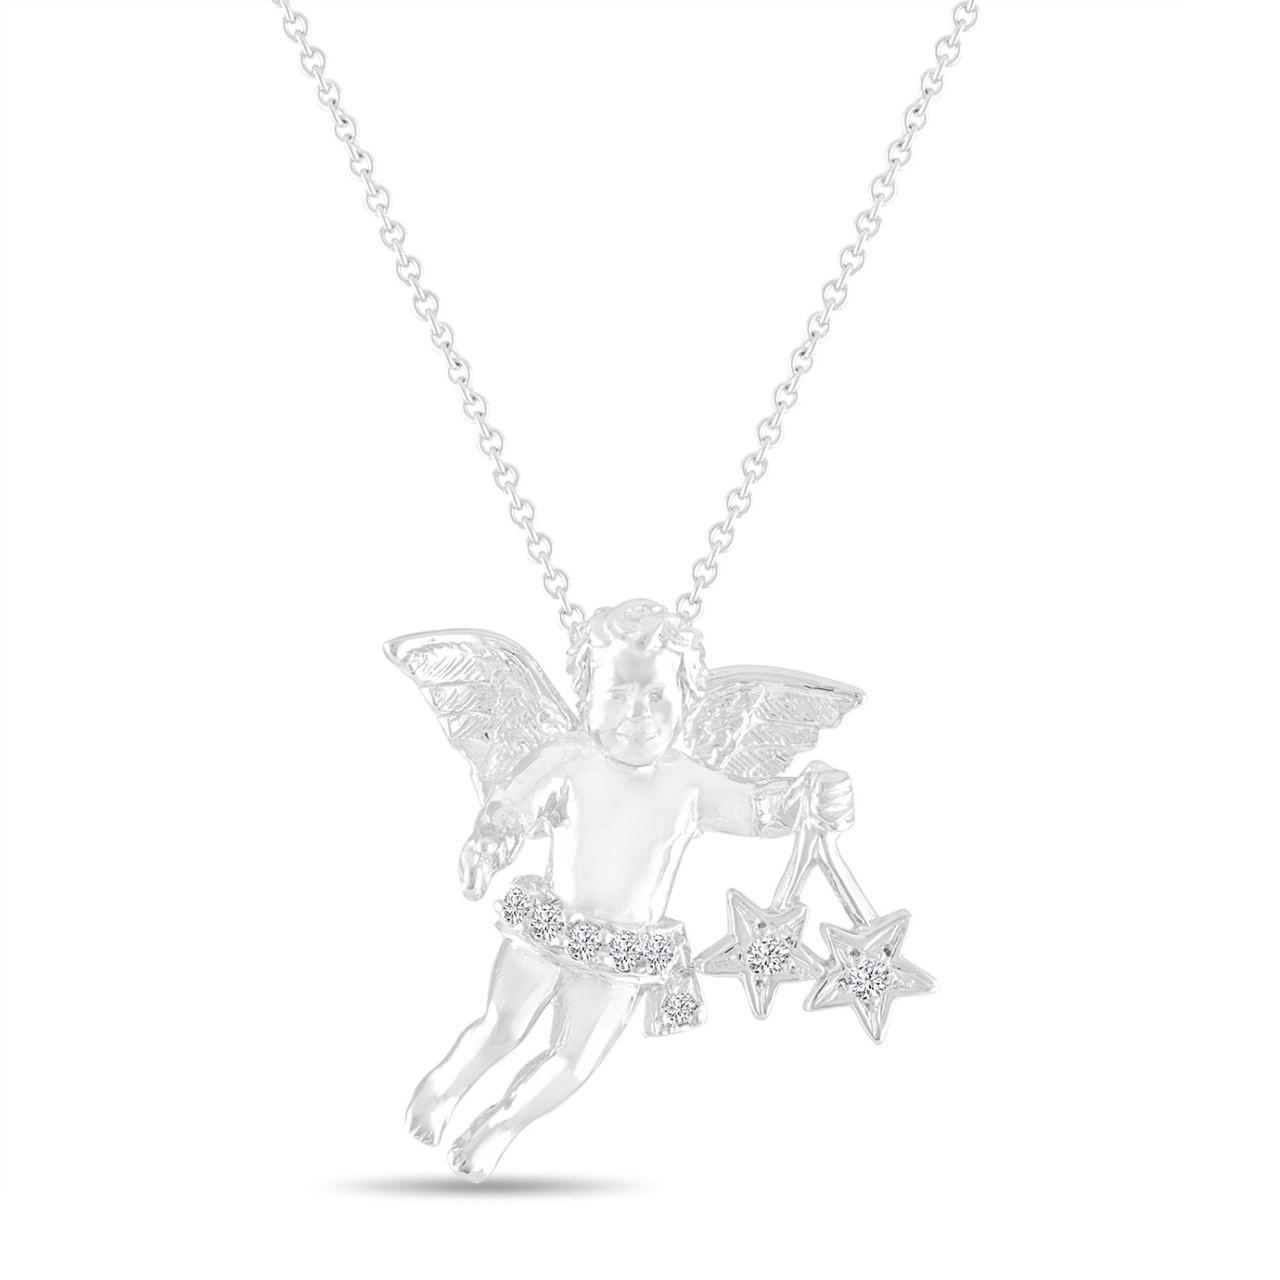 Diamond angel pendant necklace 14k white gold handmade unique 015 carat aloadofball Image collections